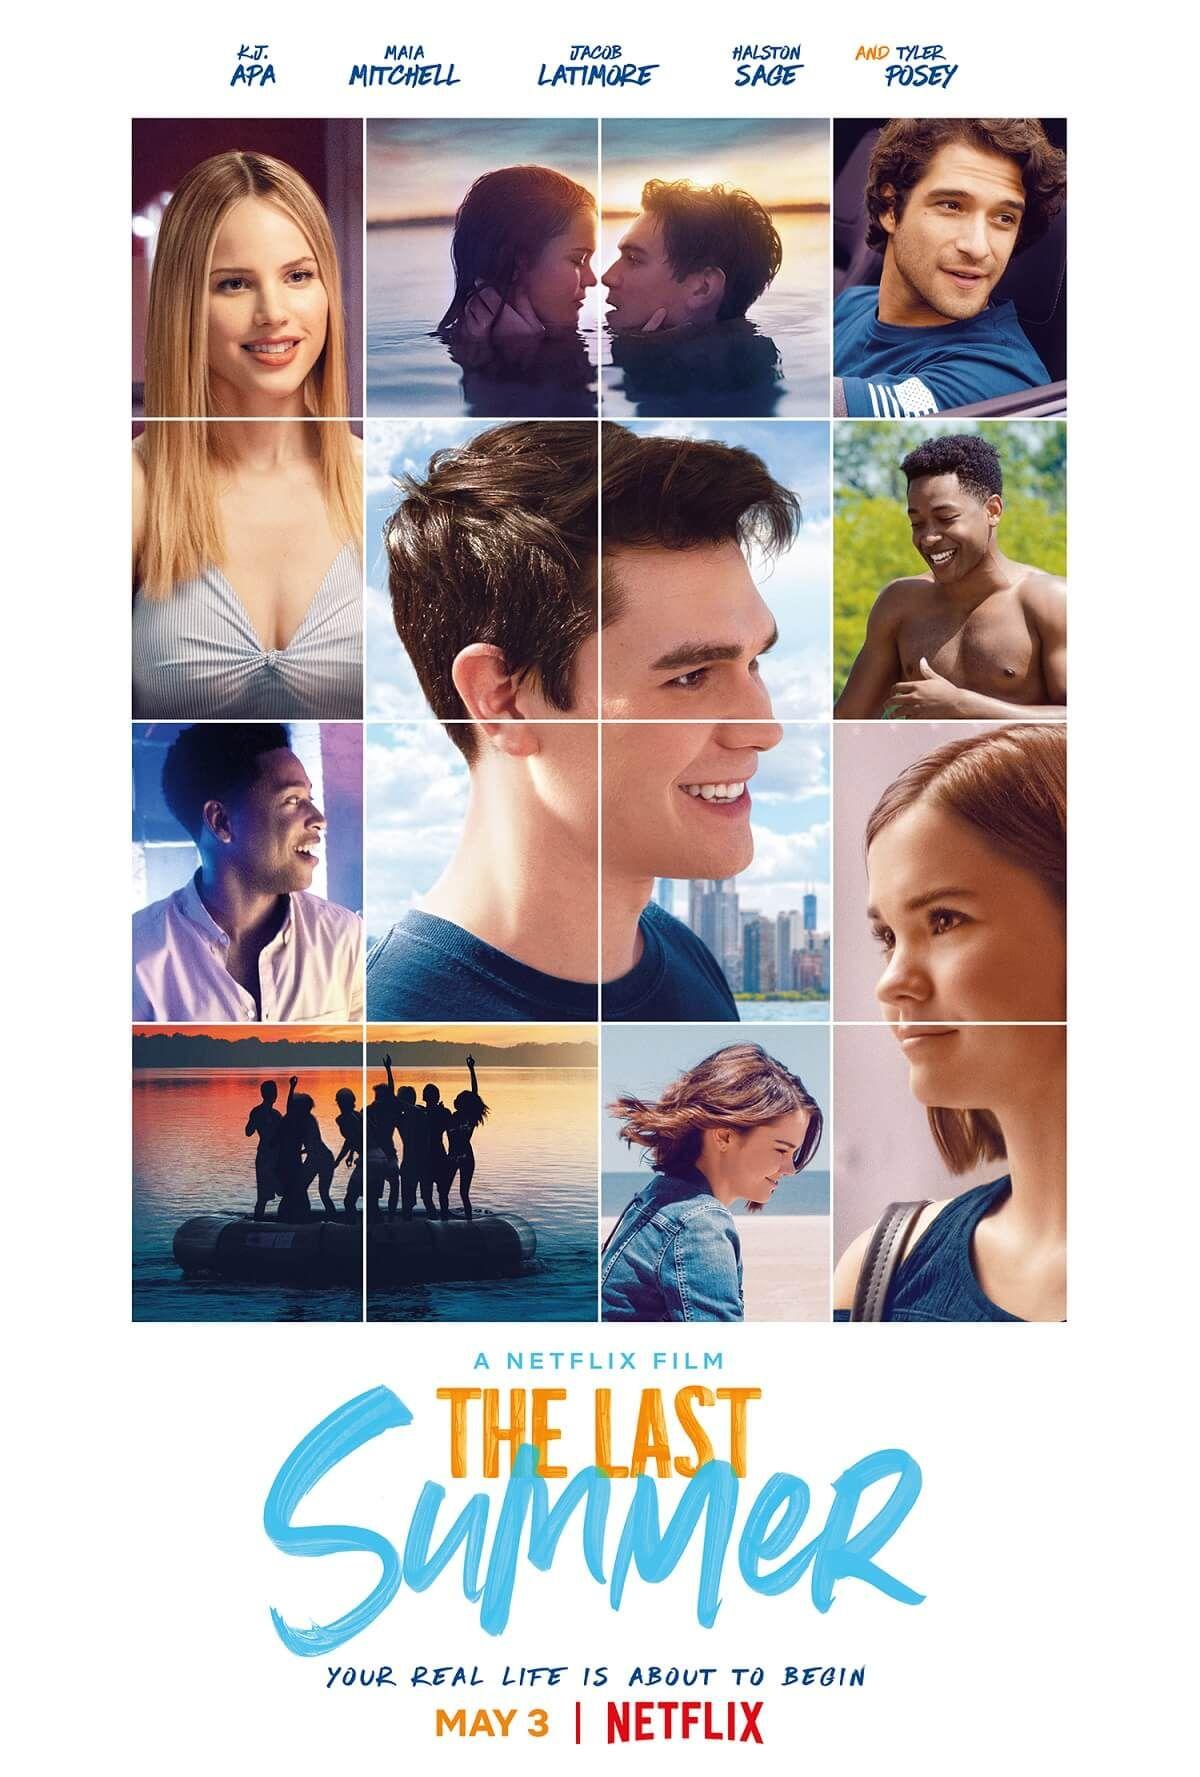 The Last Summer Trailer: KJ Apa, Maia Mitchell Star in the Romcom #netflixmovies